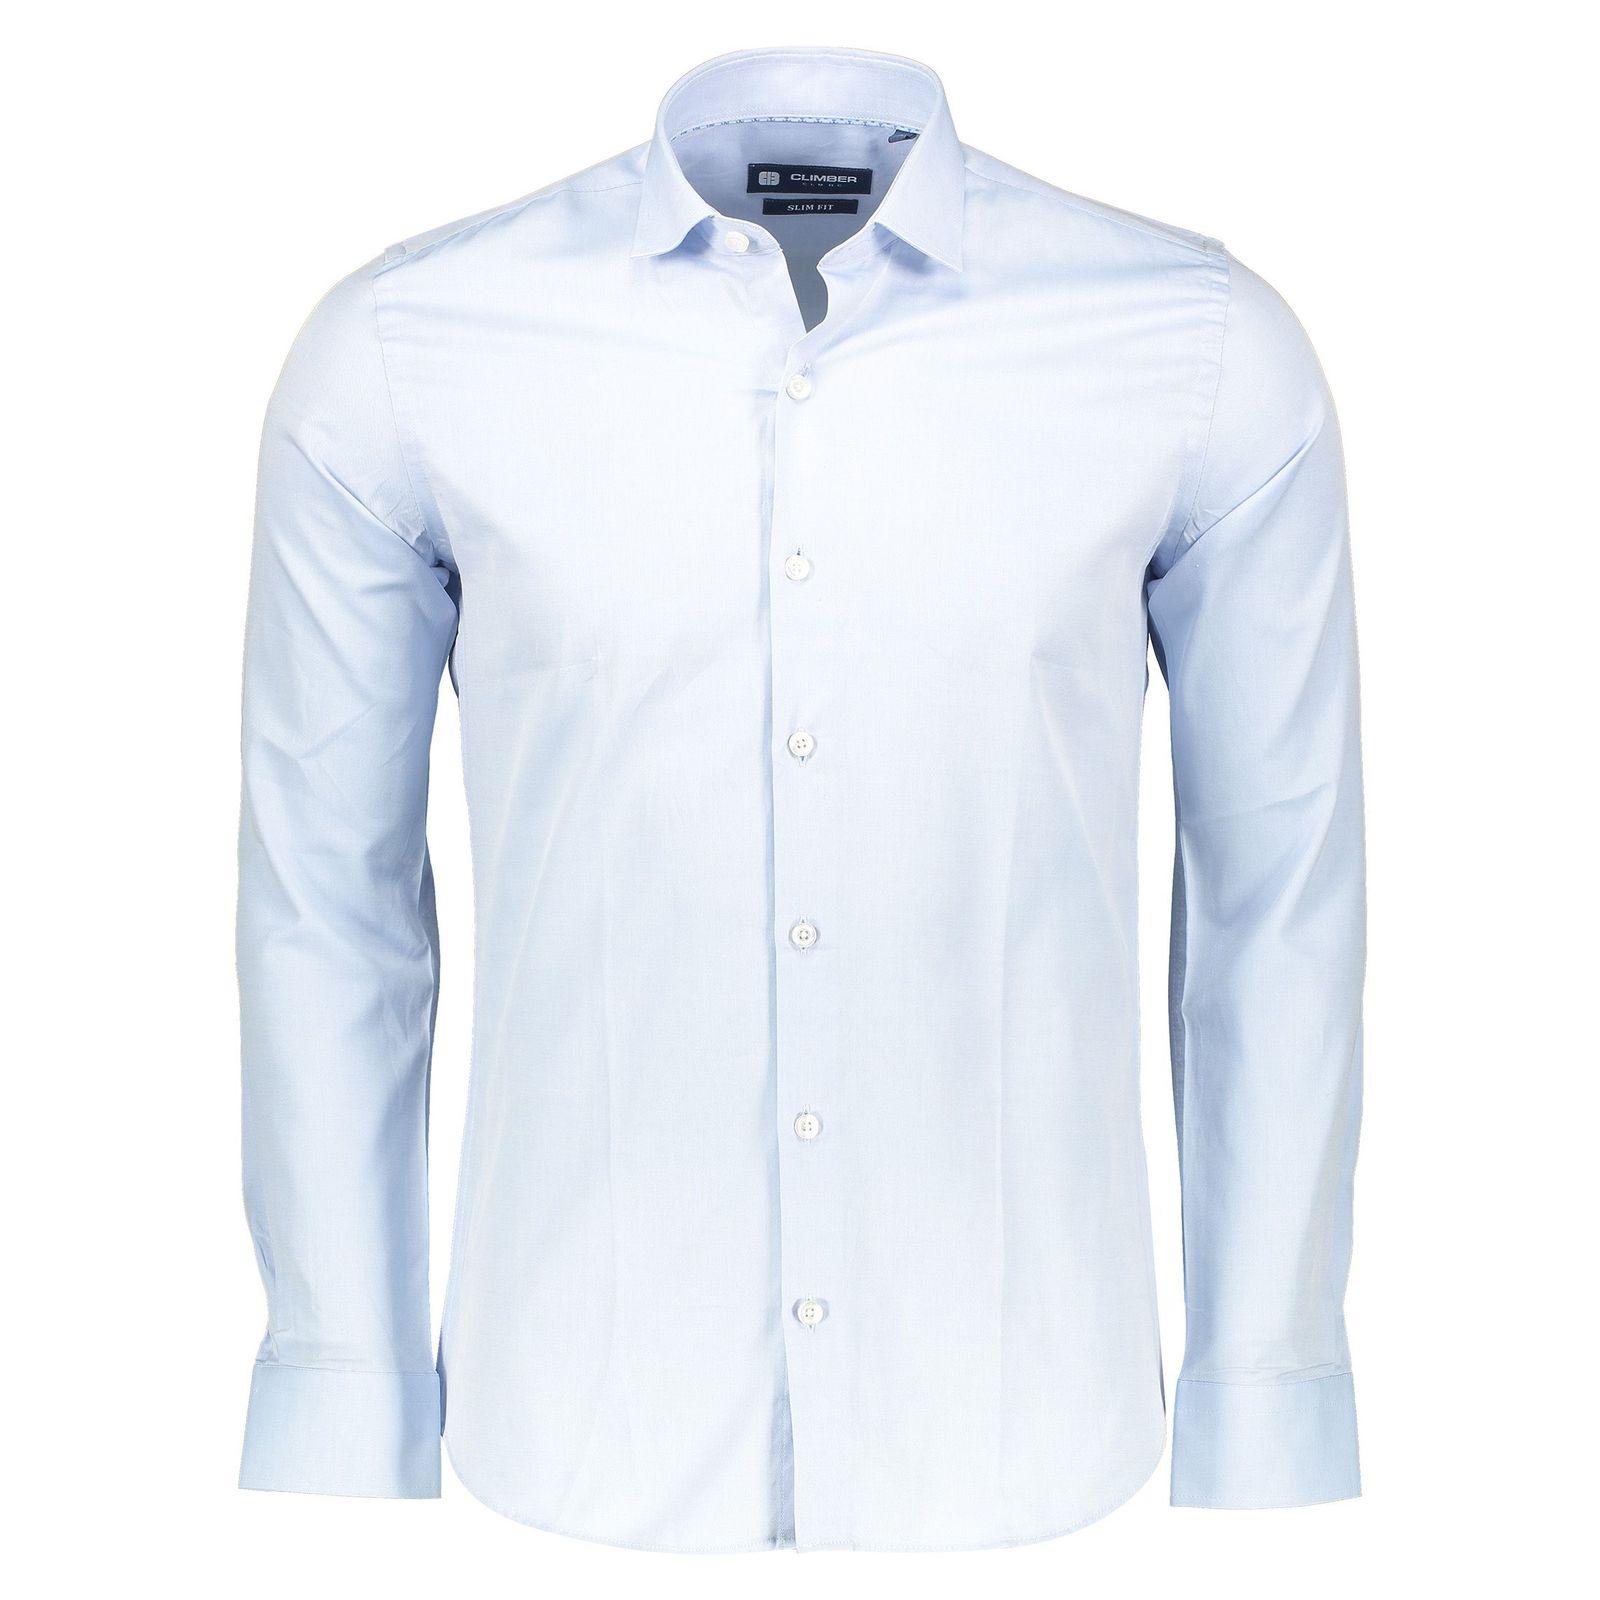 پیراهن مردانه کلایمر کد 0765 main 1 1